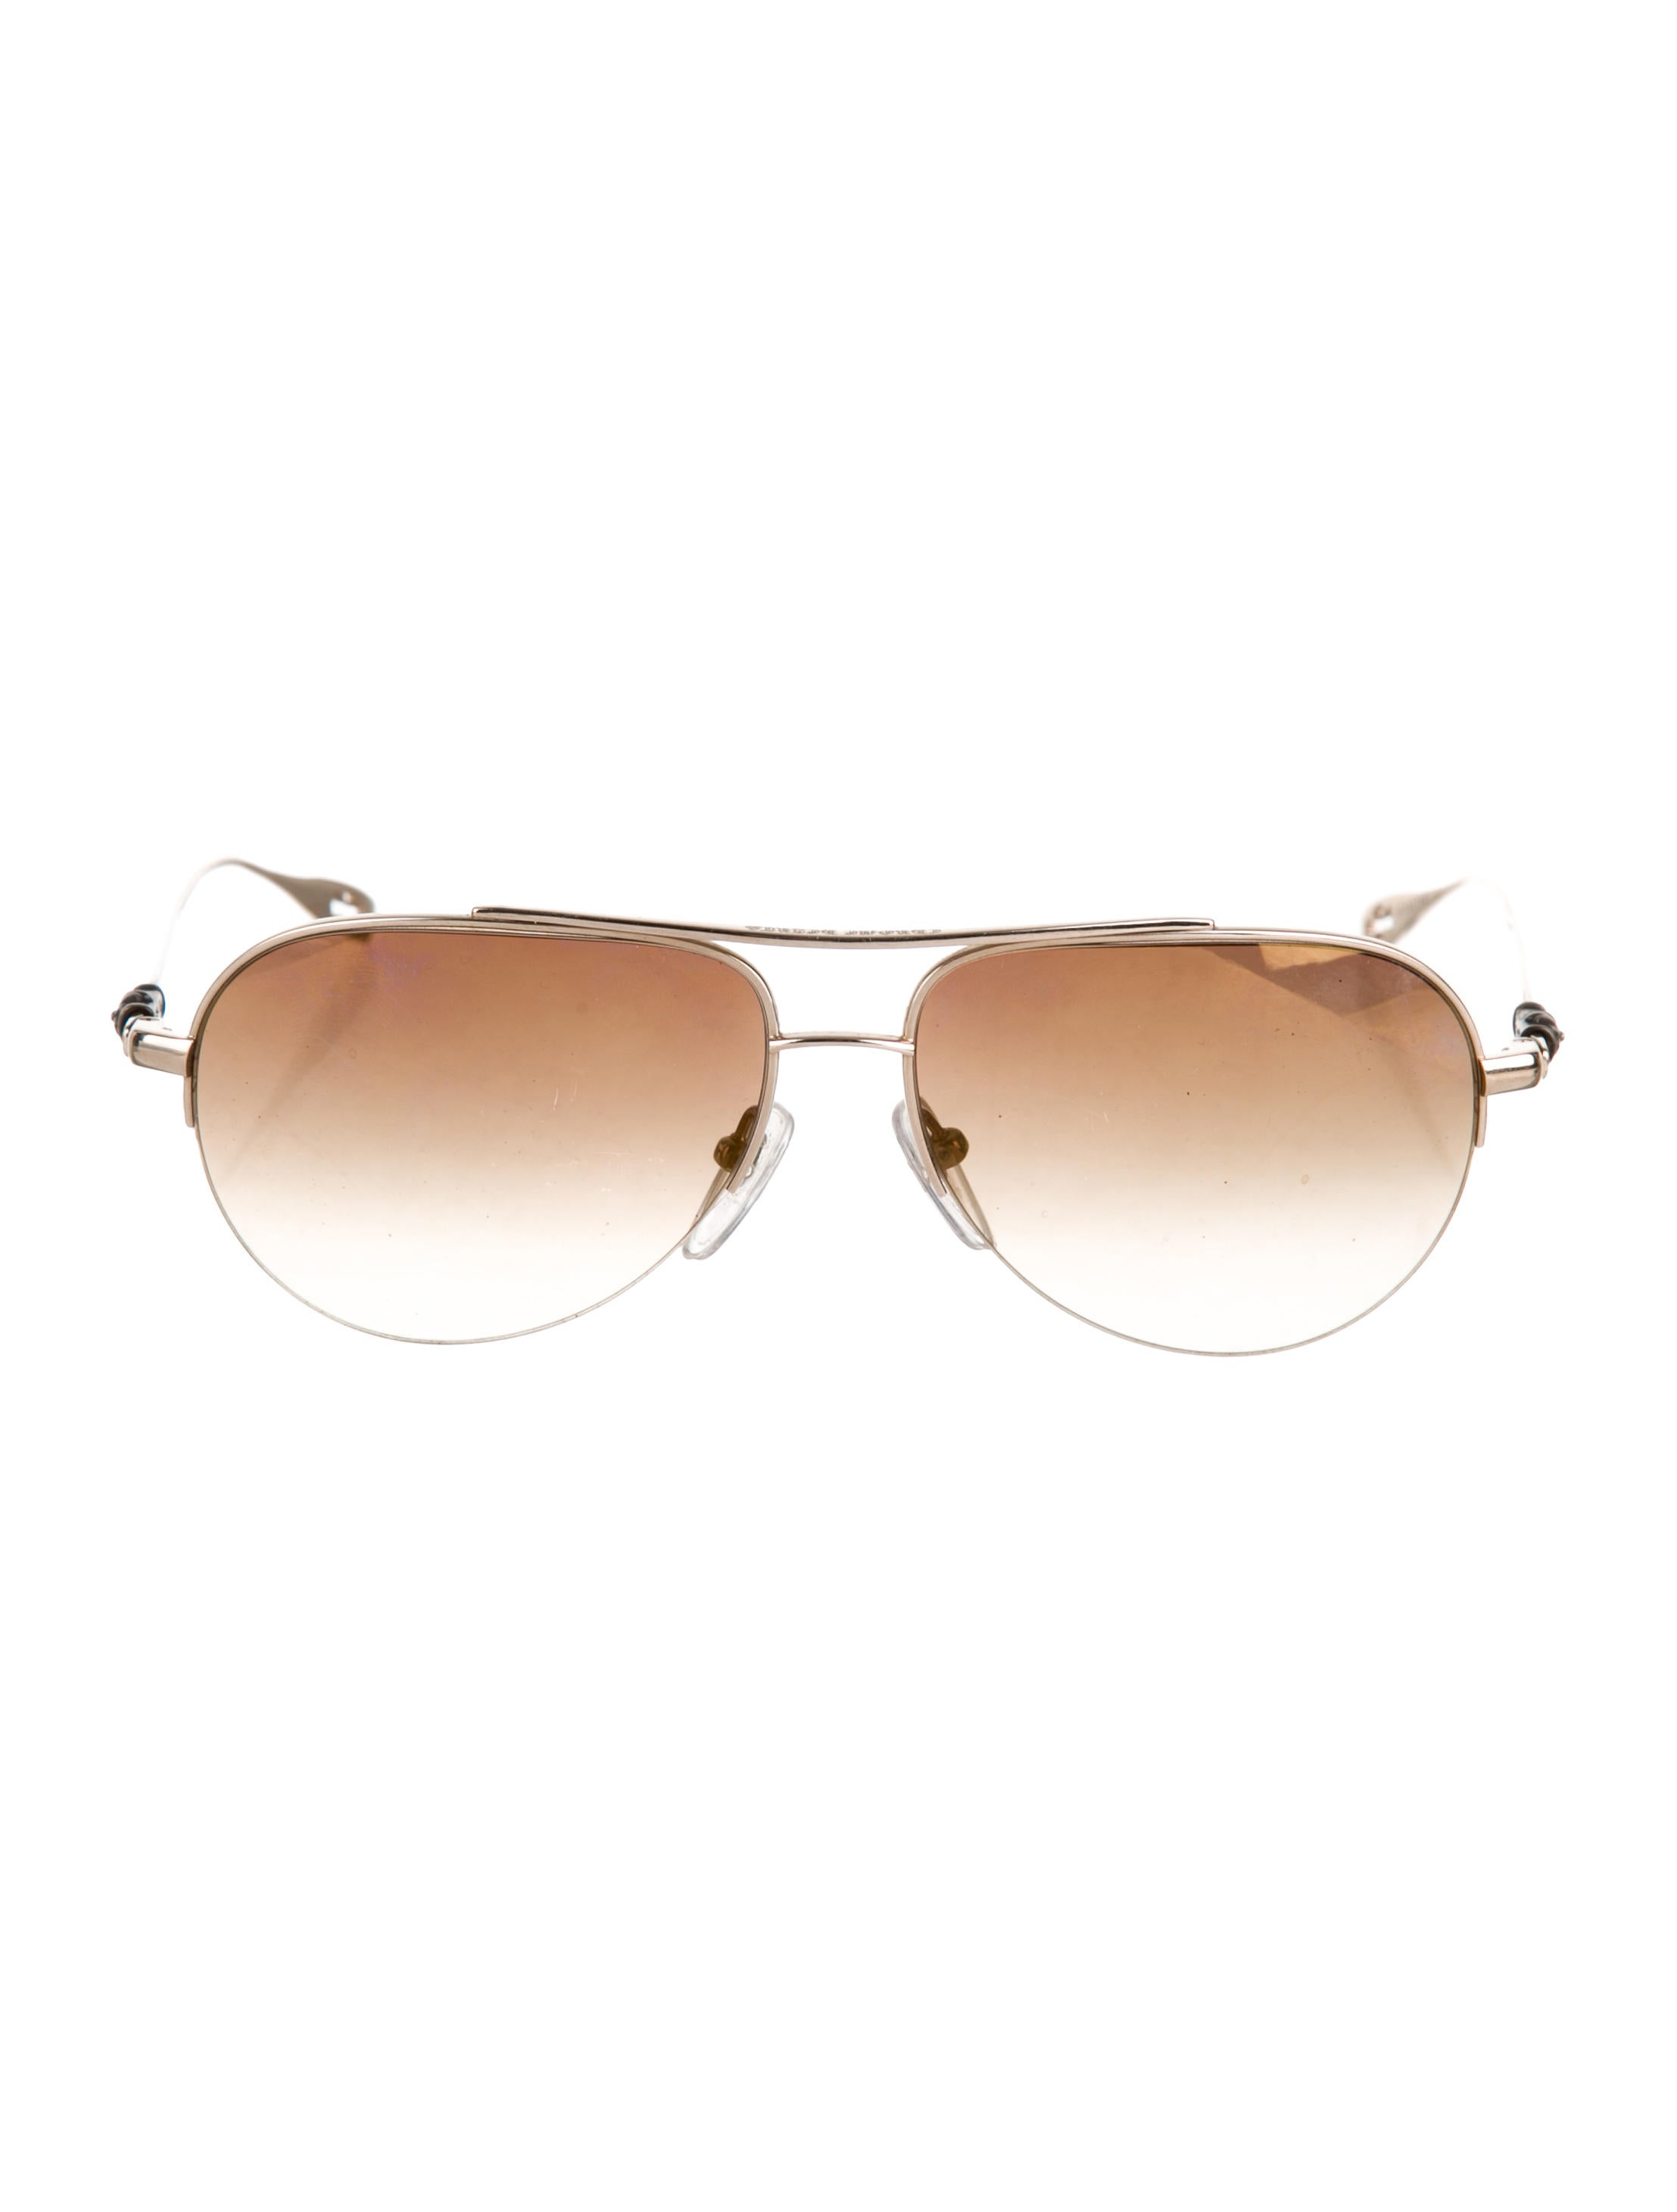 269b652b6543b Chrome Hearts Stains Aviator Sunglasses - Accessories - CHH24211 ...